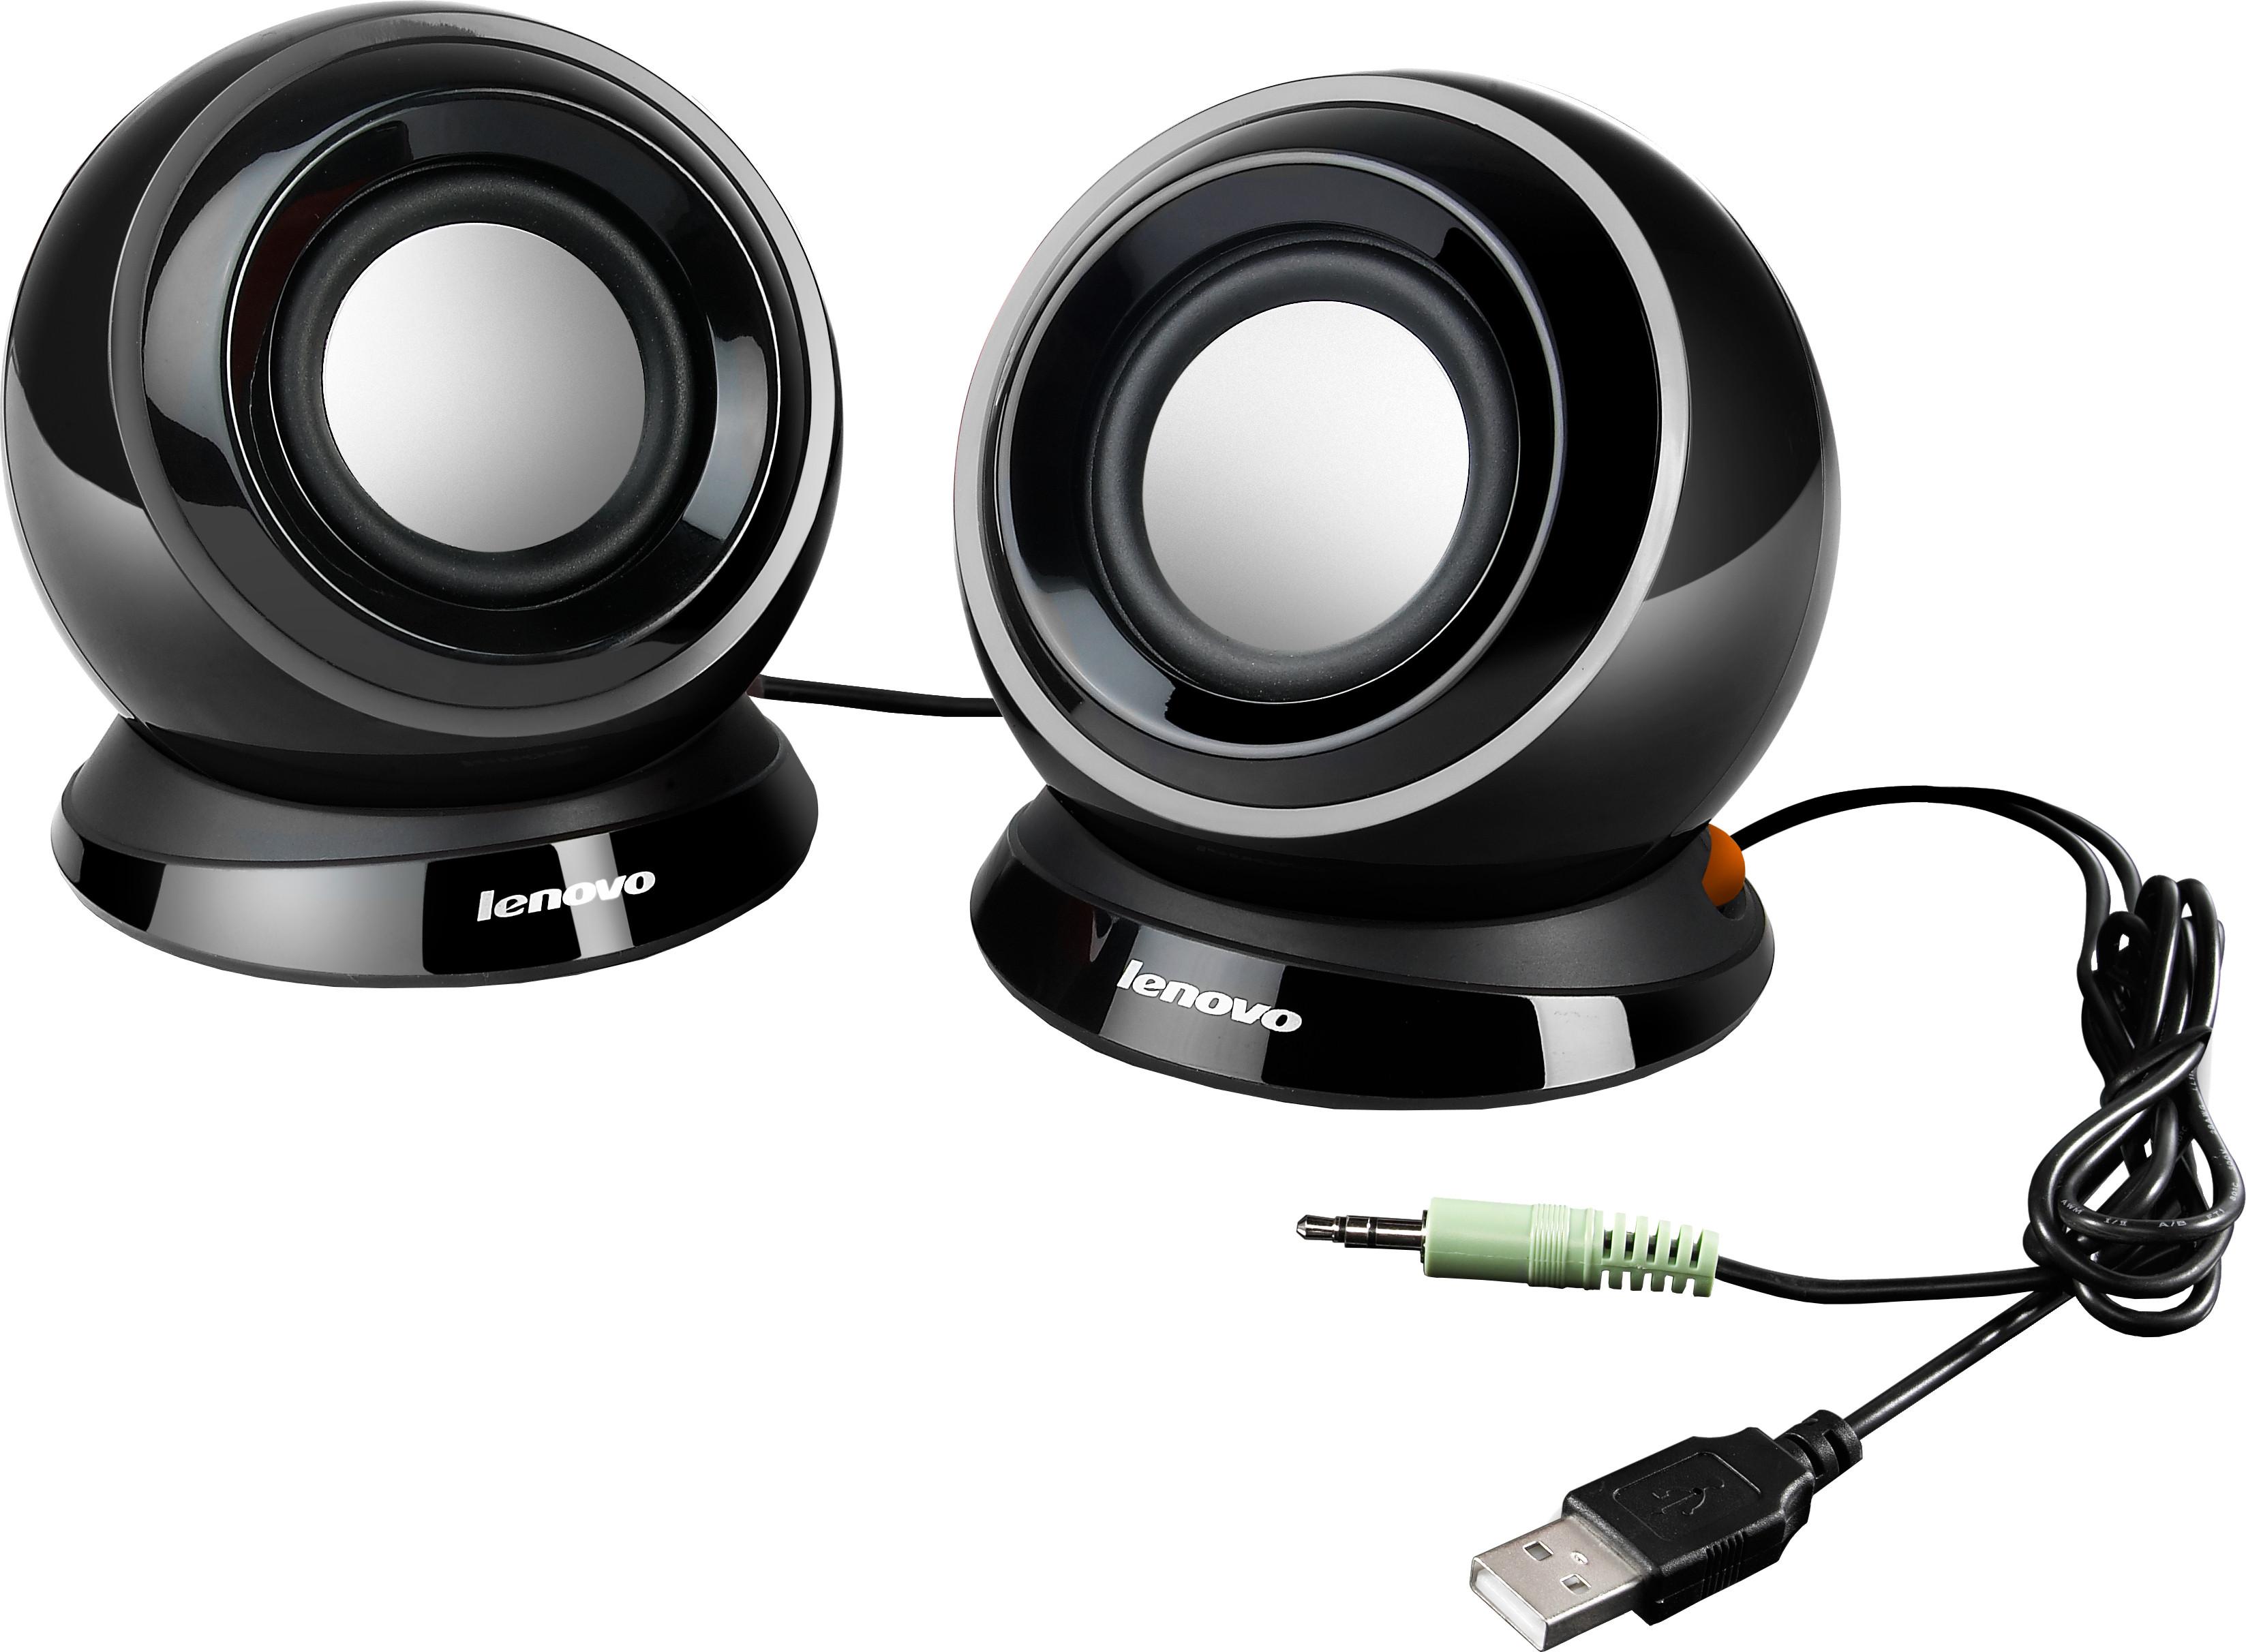 buy lenovo portable speaker m0520 online from. Black Bedroom Furniture Sets. Home Design Ideas